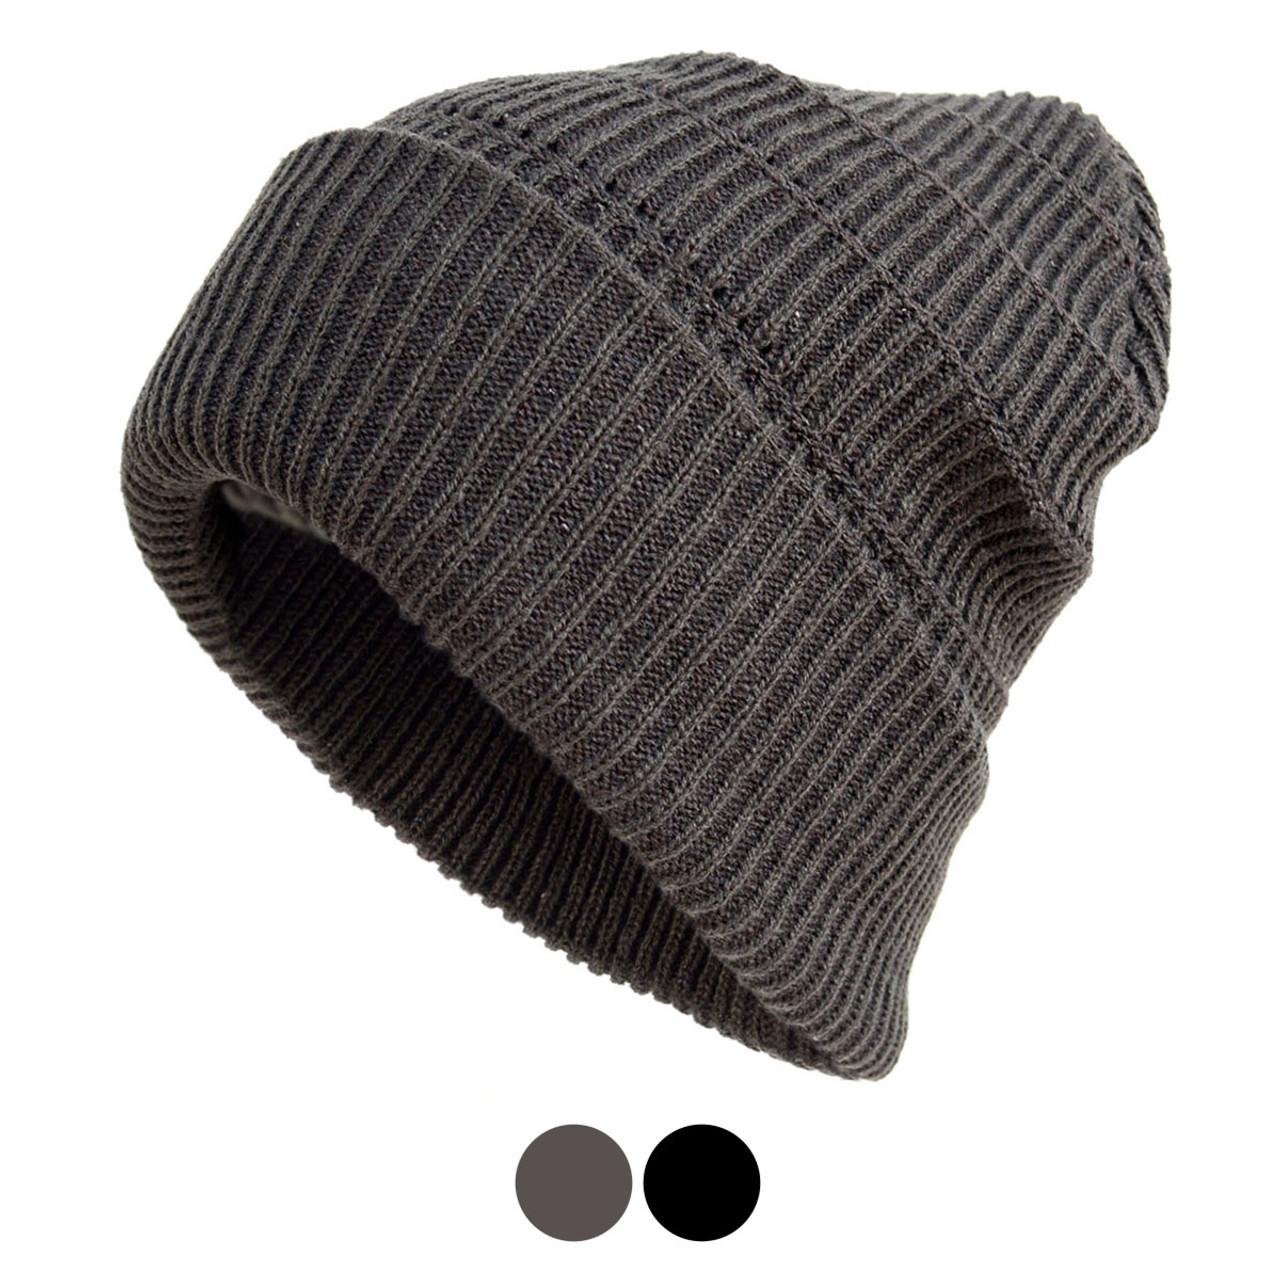 Heavy Duty Winter Outdoor Beanie Hat - MKS5289 b80603a7571